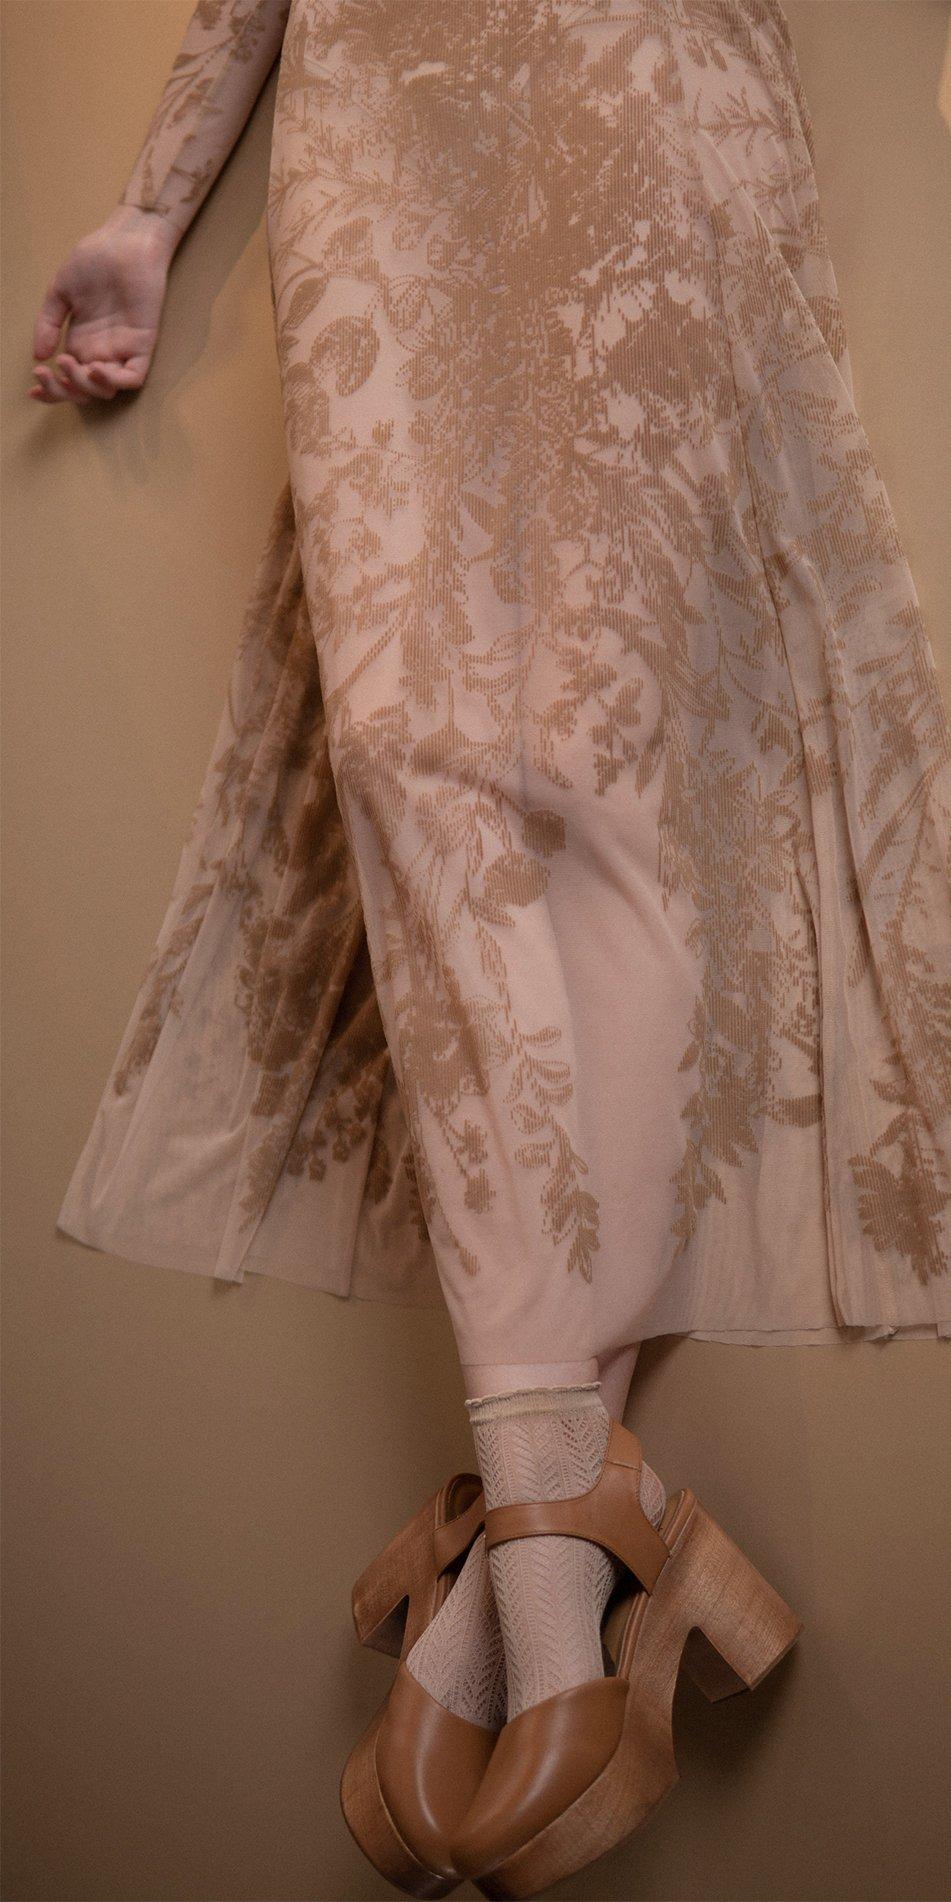 BLOSSOMS nude second skin flock print dress 2